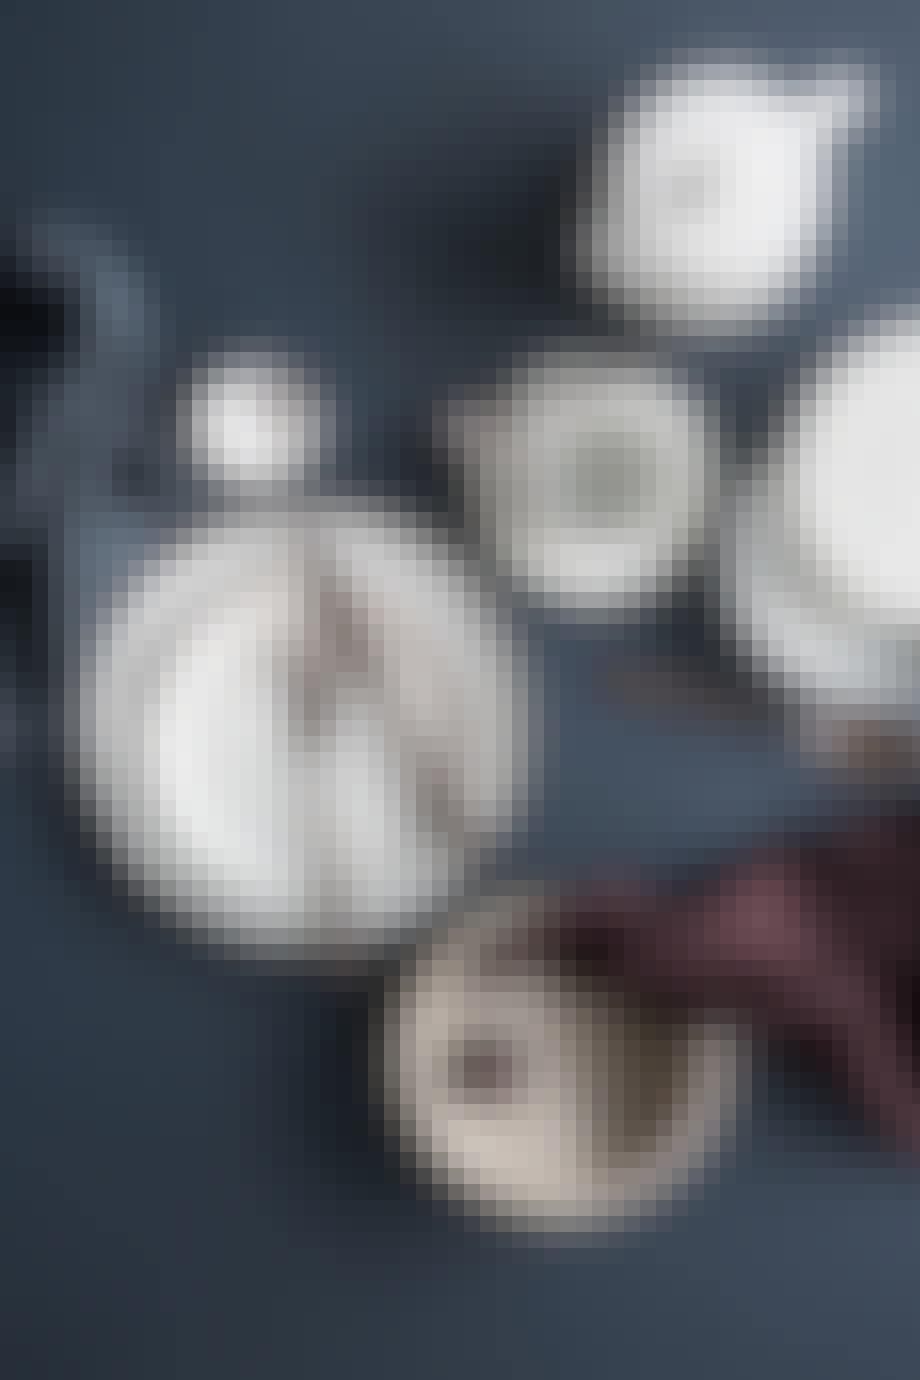 Bestikk i titanium espresso finish fra Broste Copenhagen